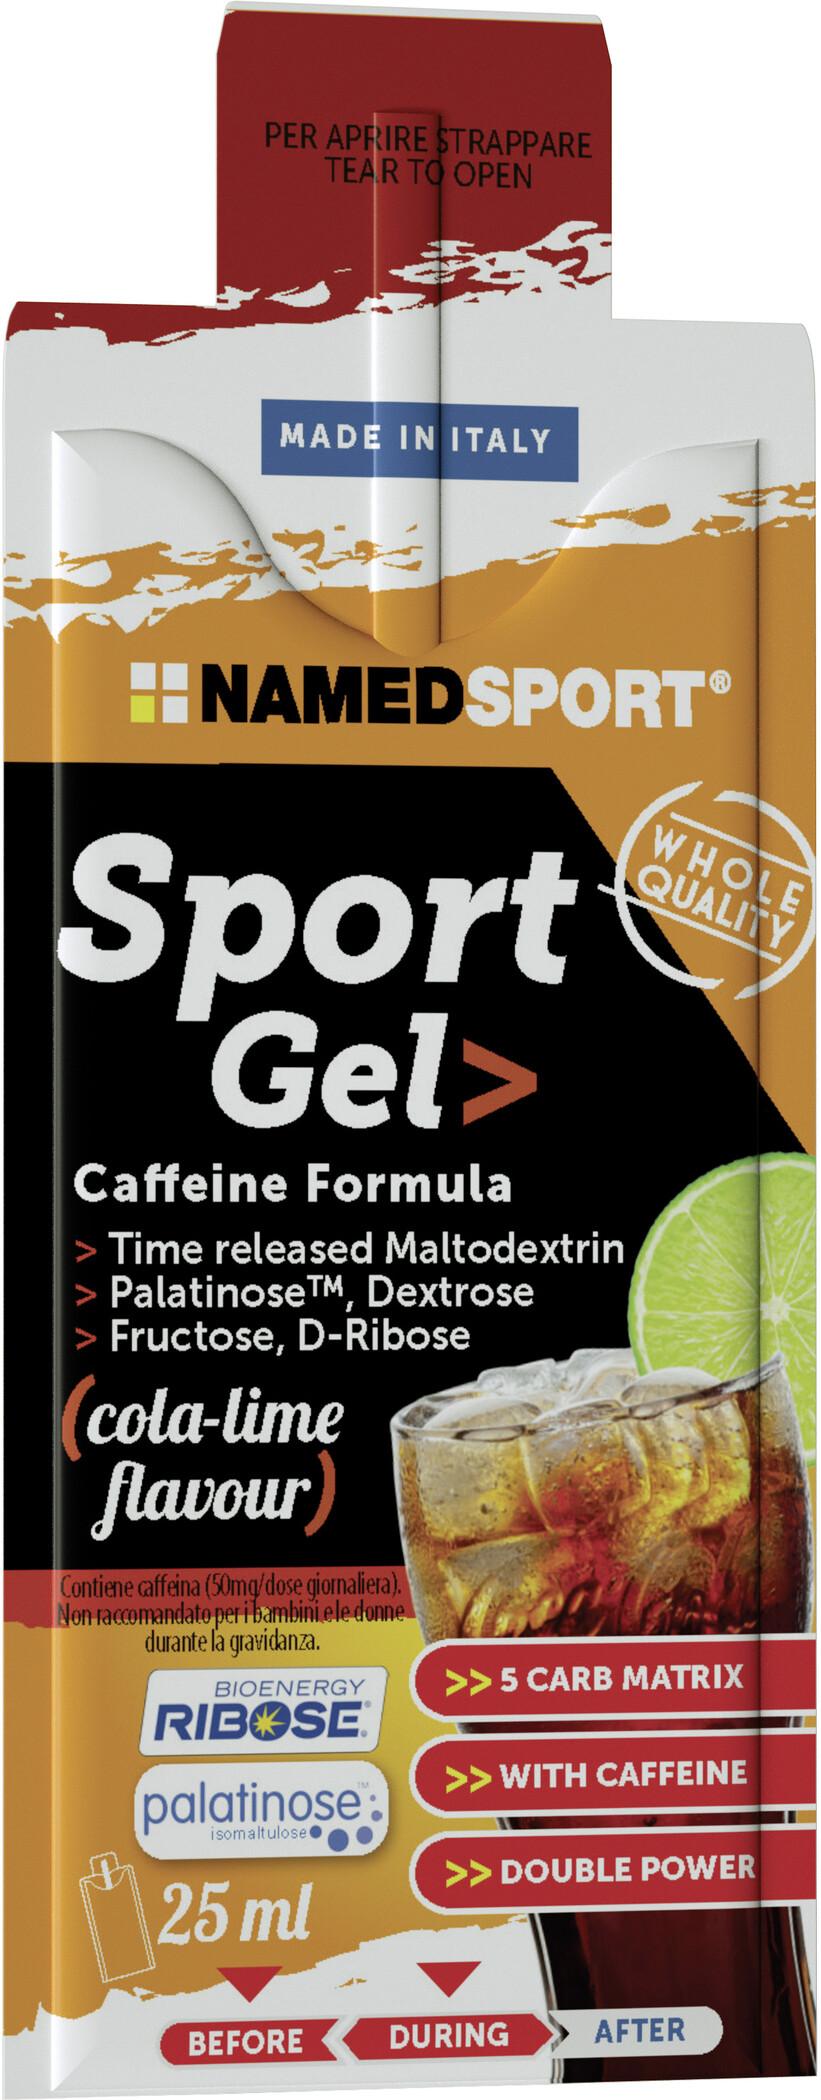 NAMEDSPORT Sport Energy Gel Box 15x25ml, Cola Lime   Energy gels